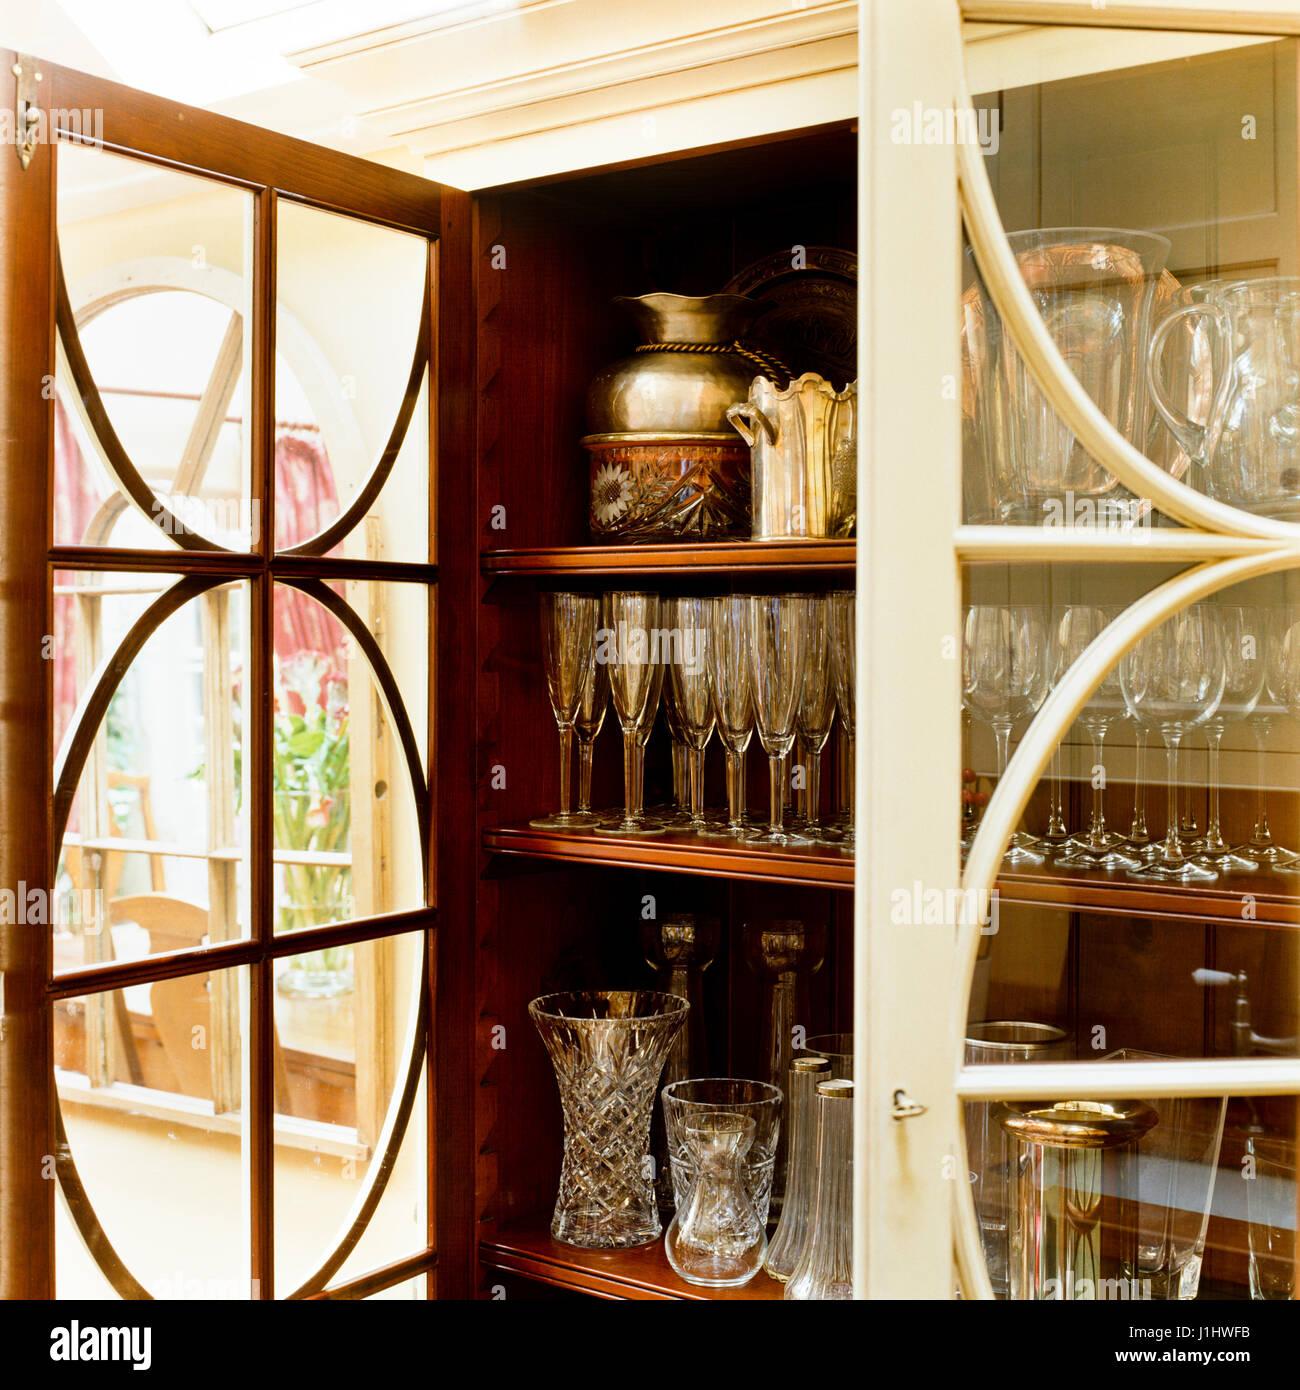 Shelves of glassware. - Stock Image